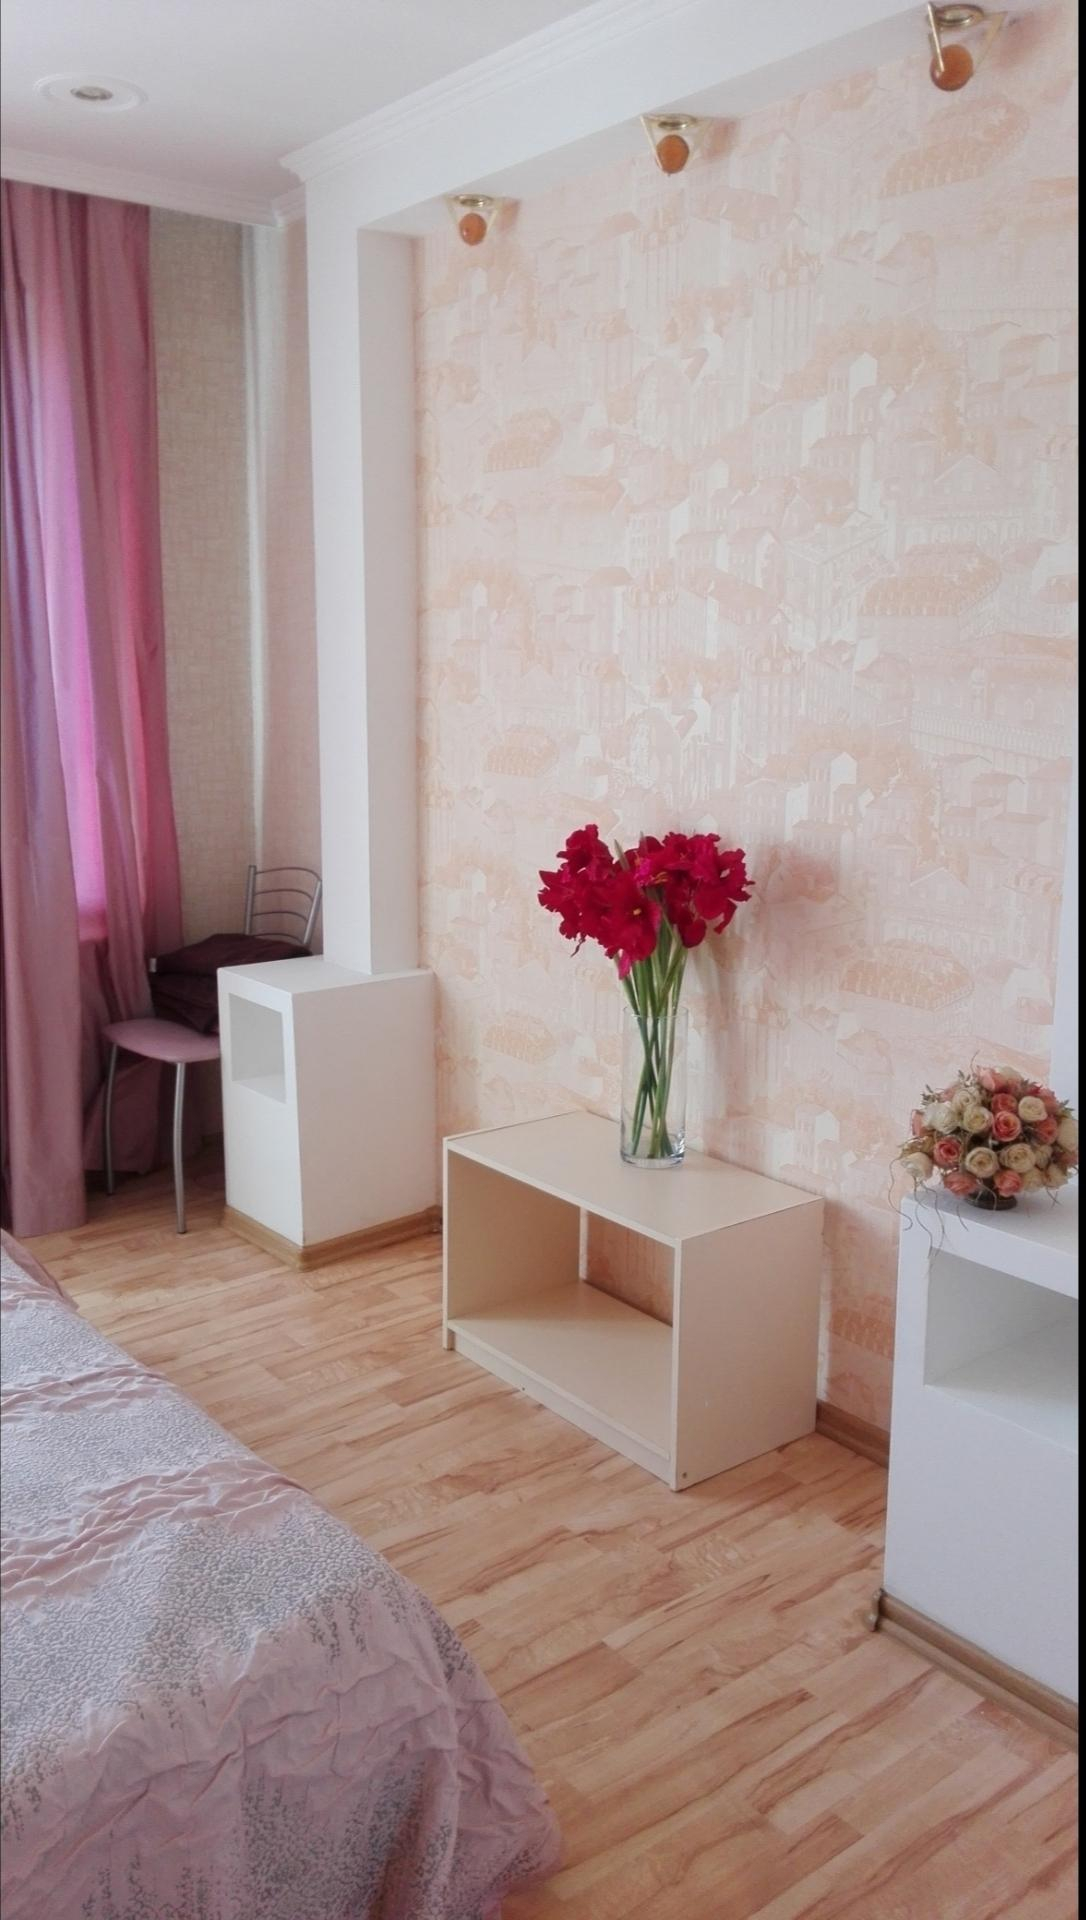 2к квартира улица Горького, 34 | 23000 | аренда в Красноярске фото 0